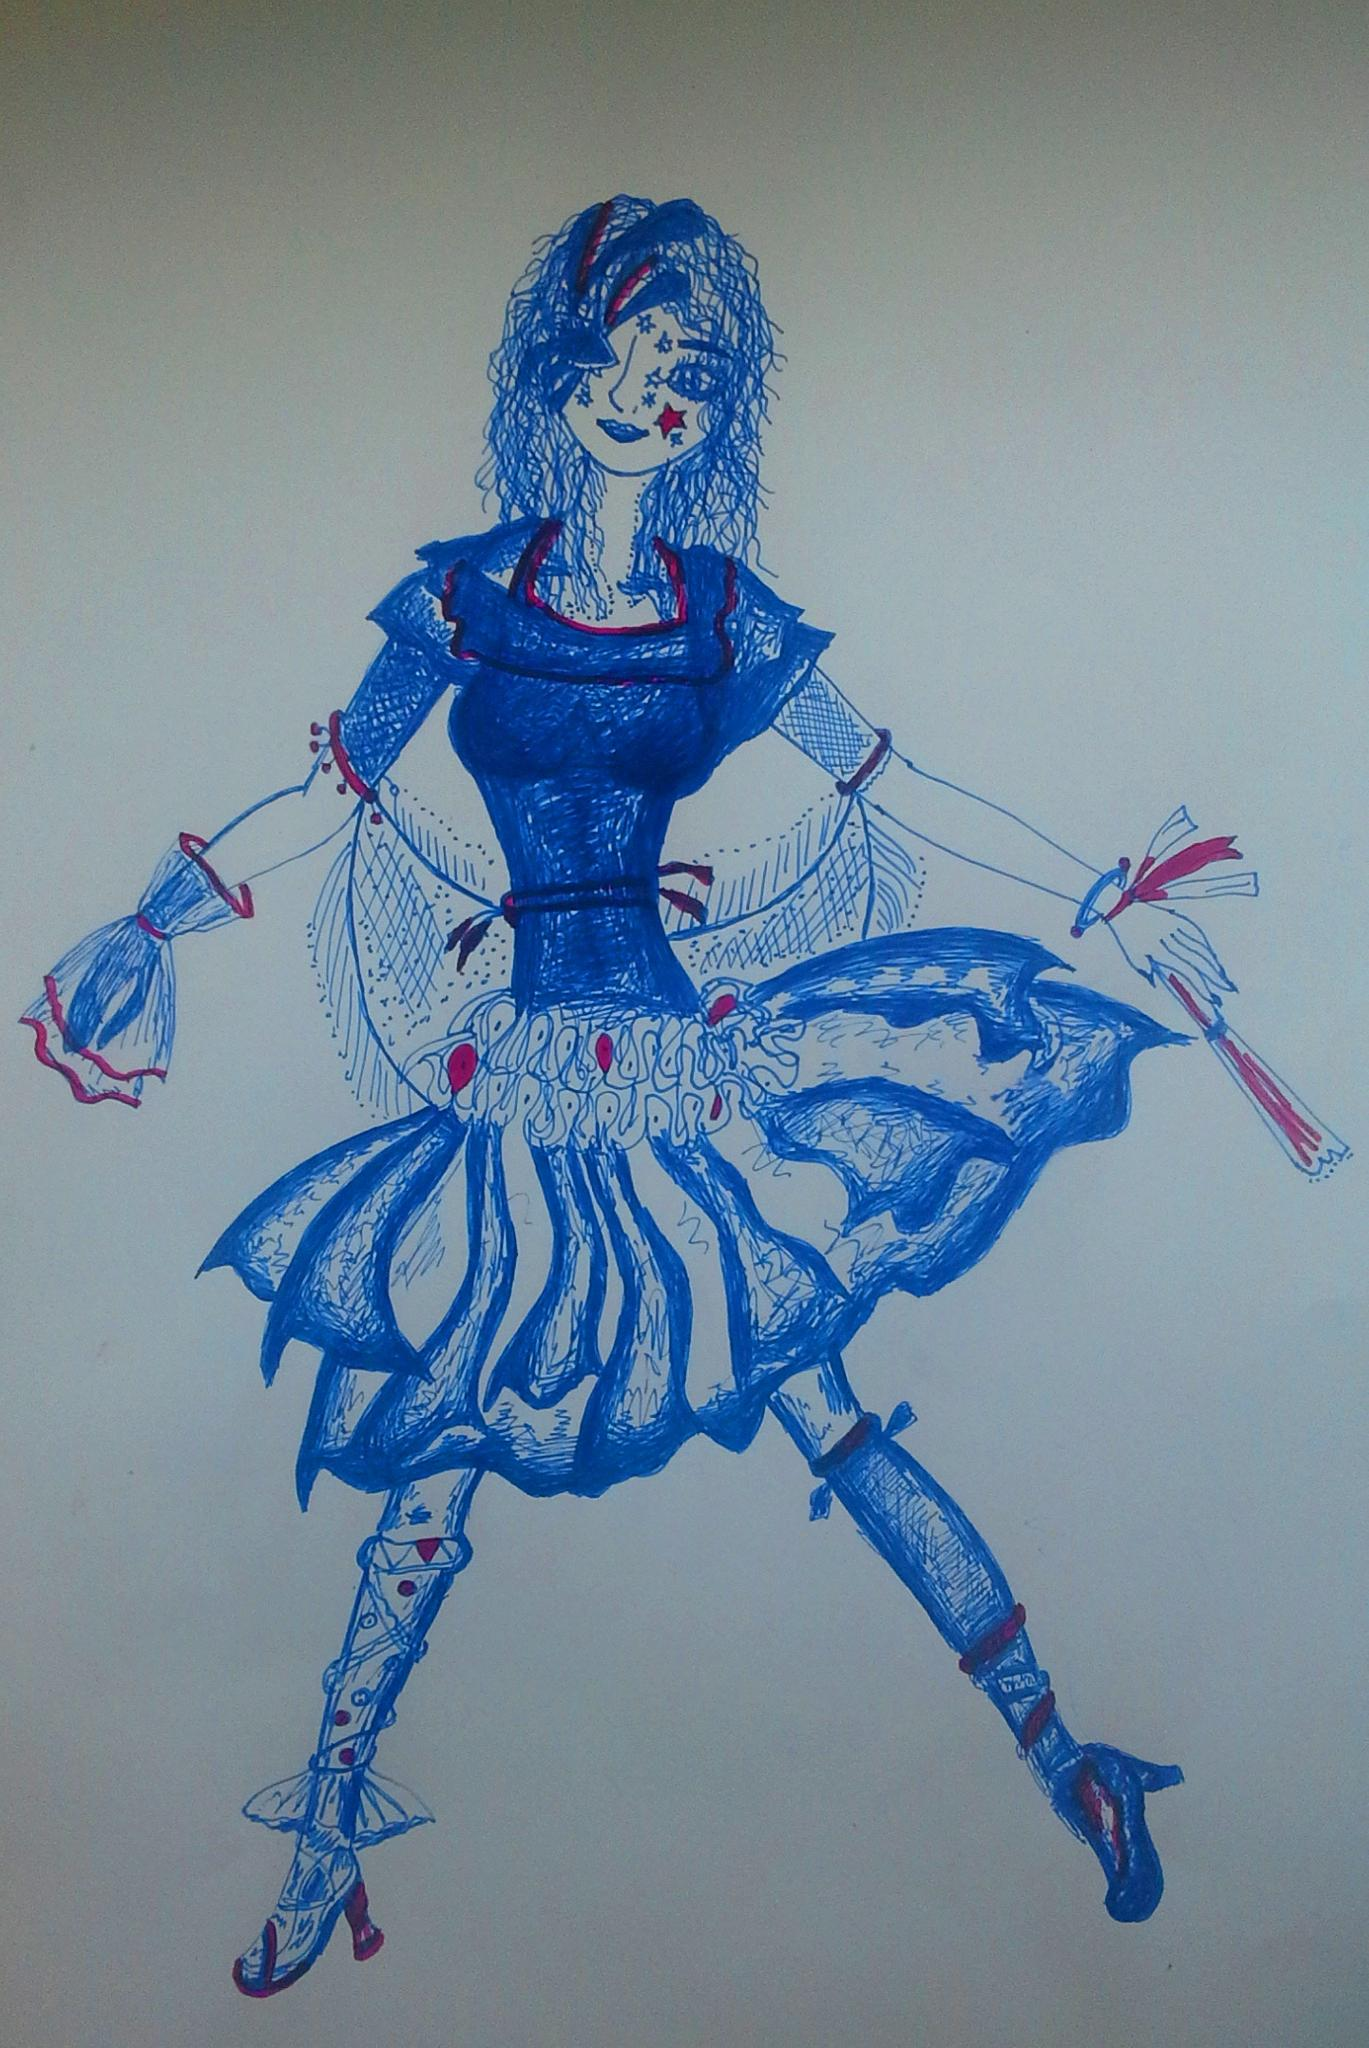 The Painted Girl by Simona Bakševičiūtė